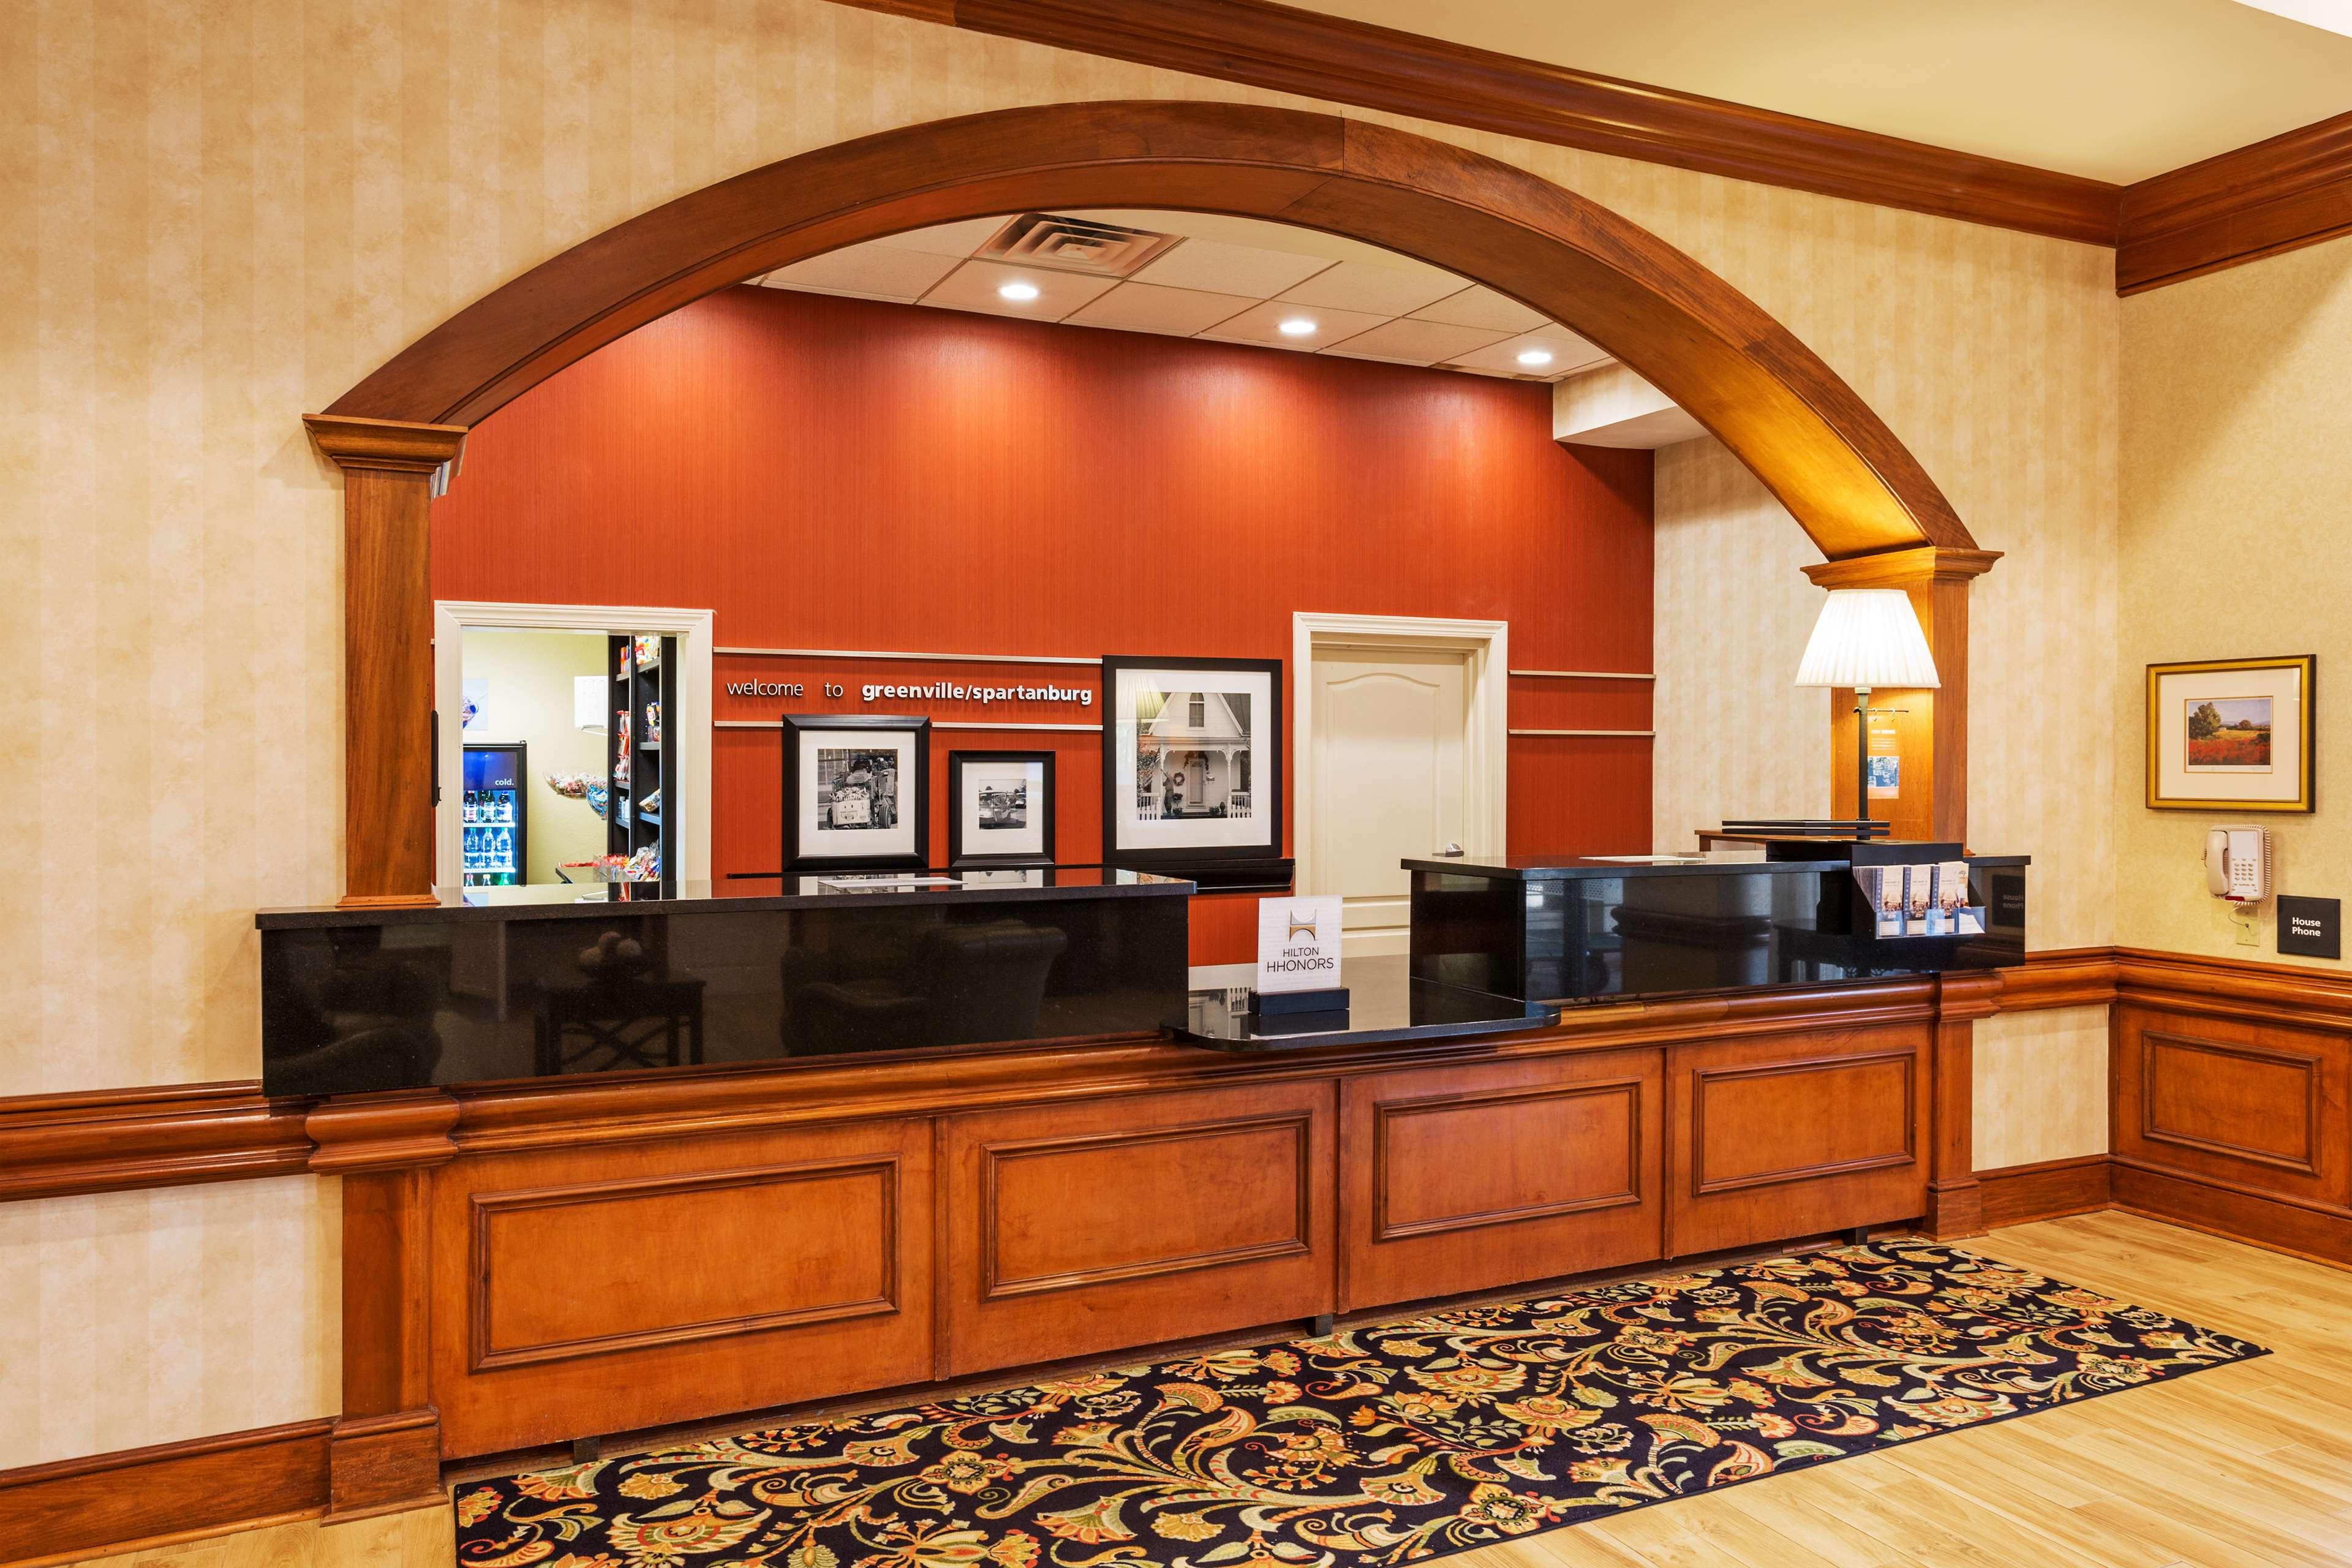 Hampton Inn & Suites Greenville/Spartanburg I-85 image 4